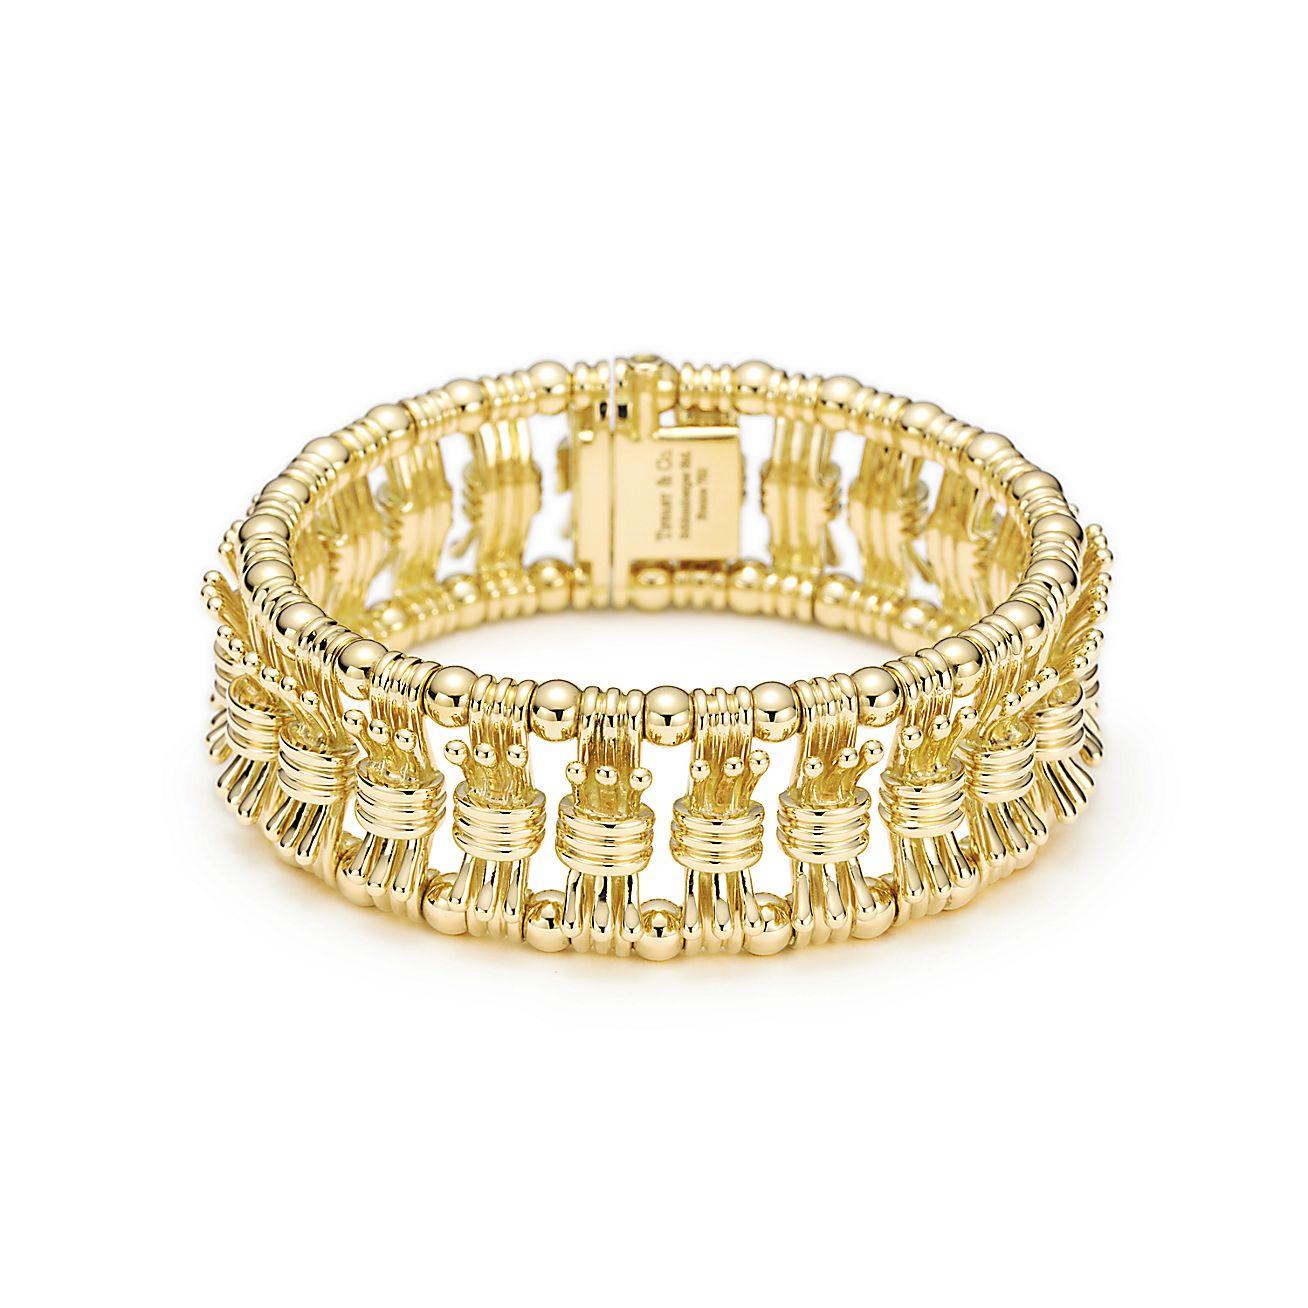 Tiffany & Co. Schlumberger®:Bow Tie Bracelet